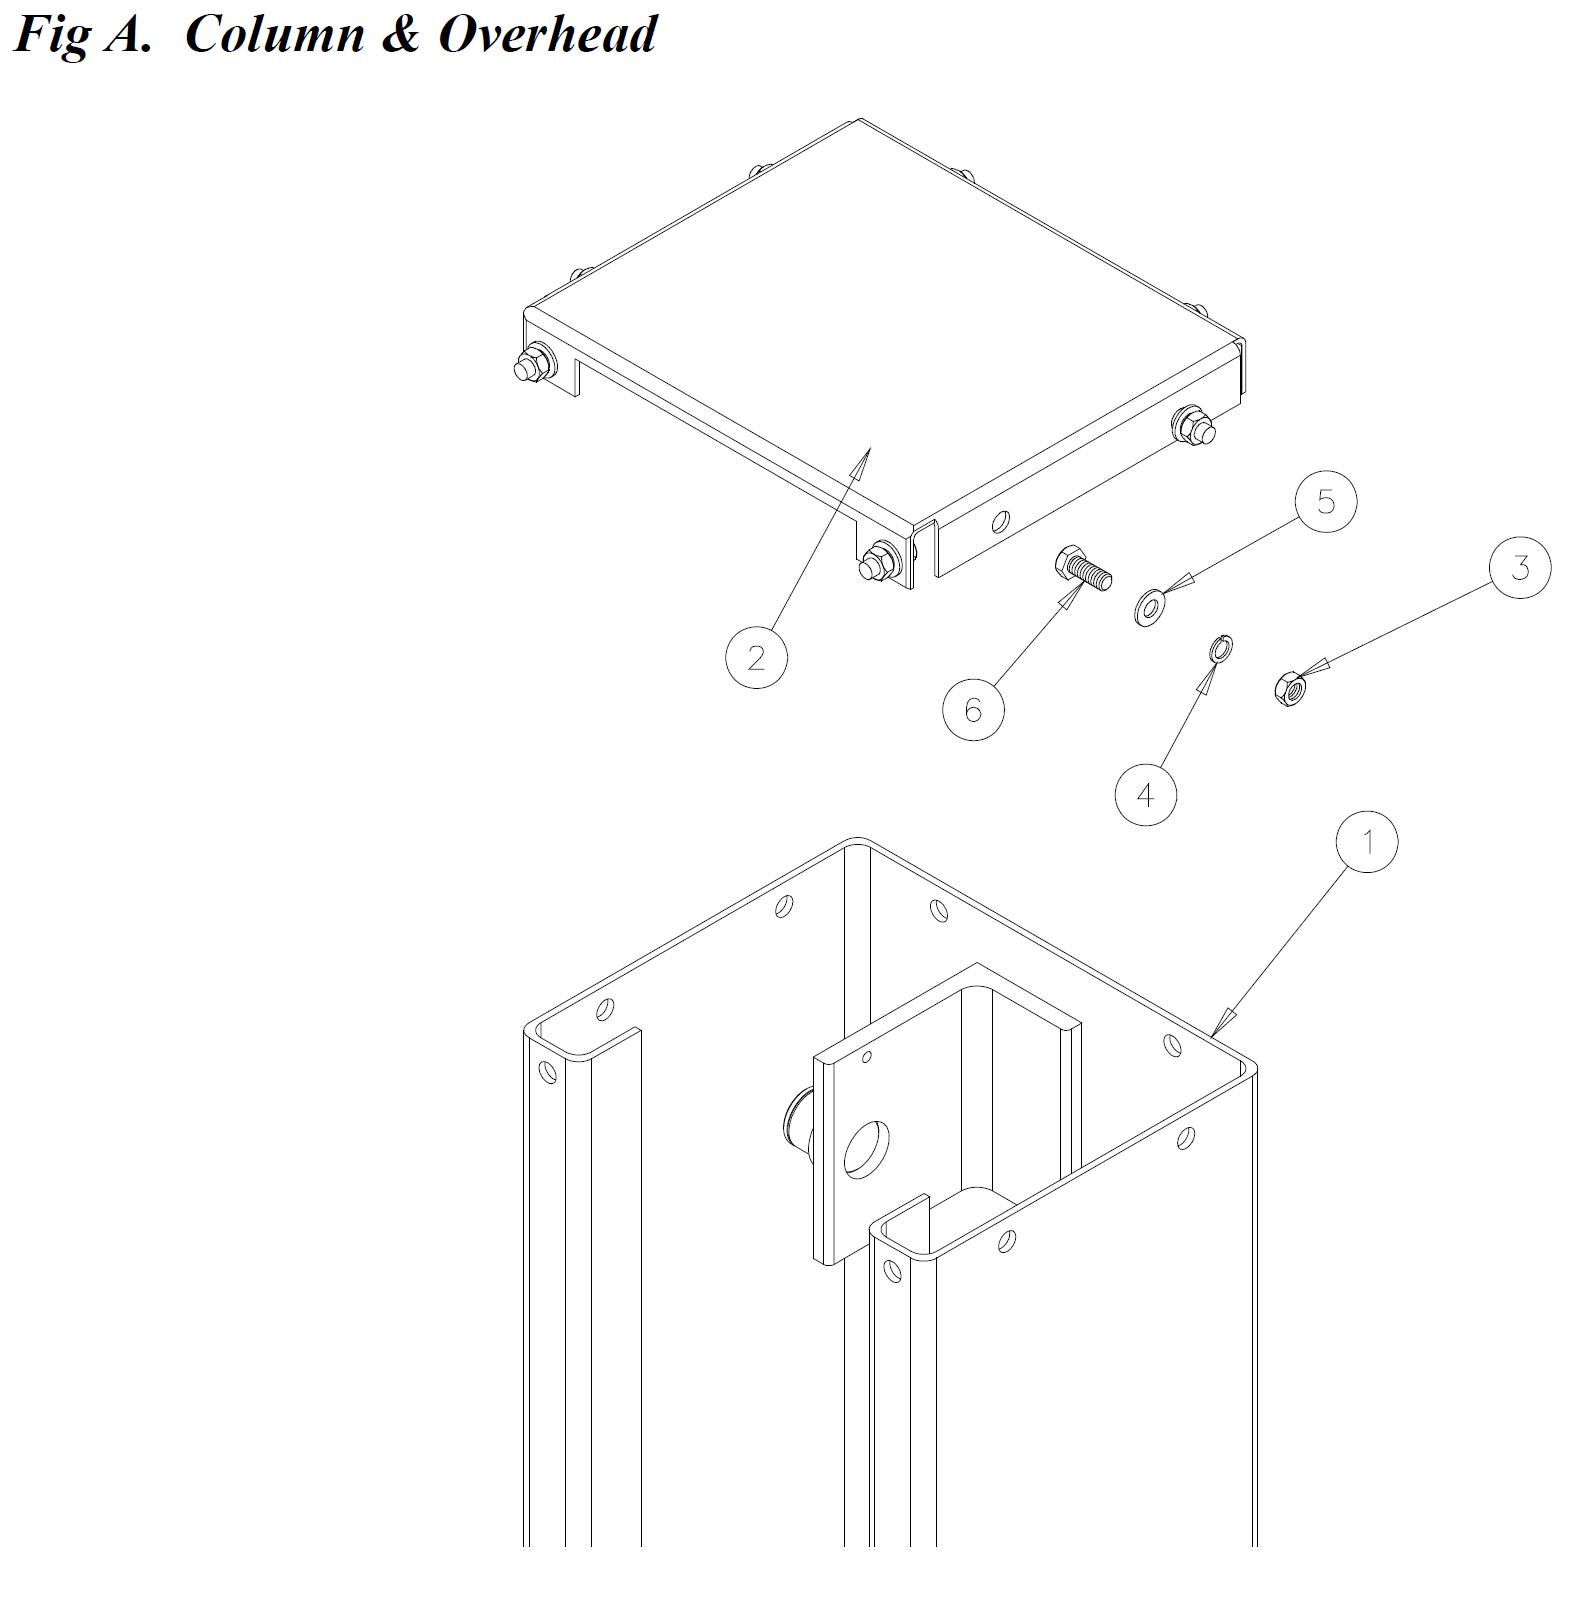 clfp9-column-overhead-diagram.png